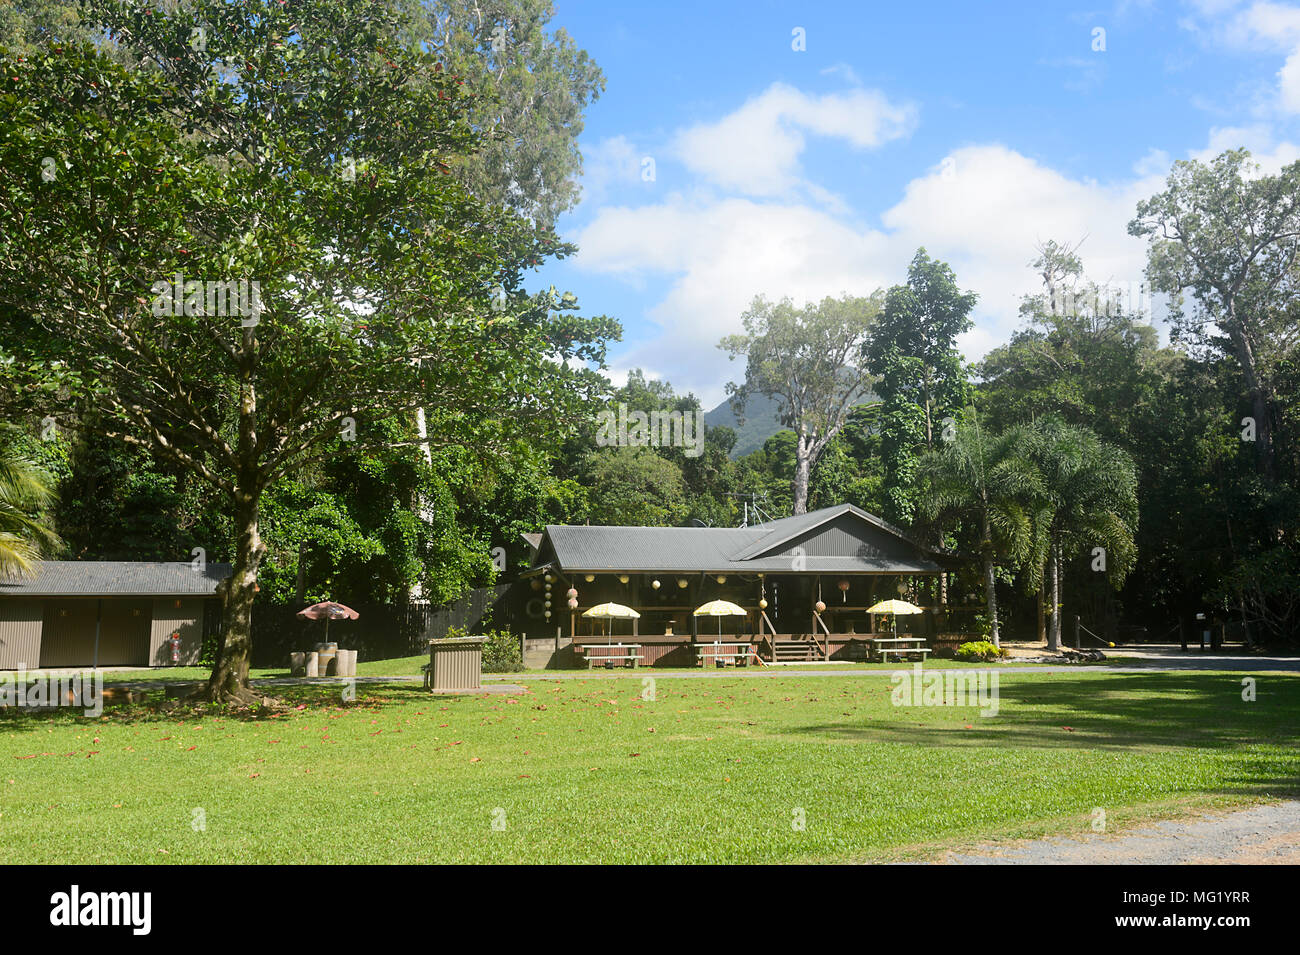 Café Restaurant of the popular Cape Tribulation Campsite, Daintree National Park, Far North Queensland, FNQ, QLD, Australia - Stock Image